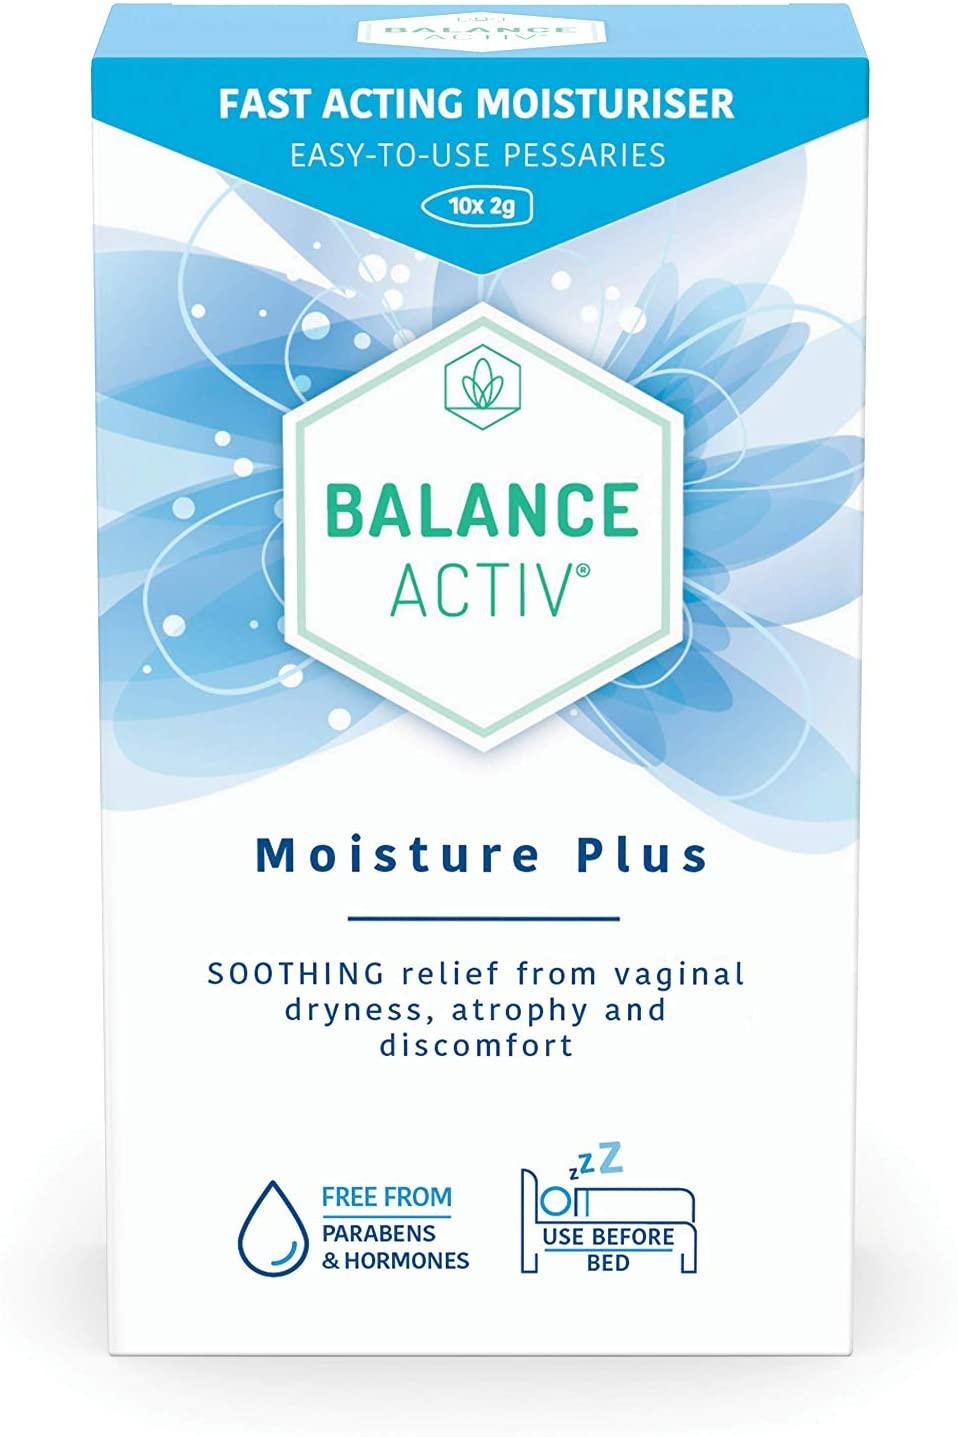 Balance Activ Menopause Moisture Plus - 10 Pessaries